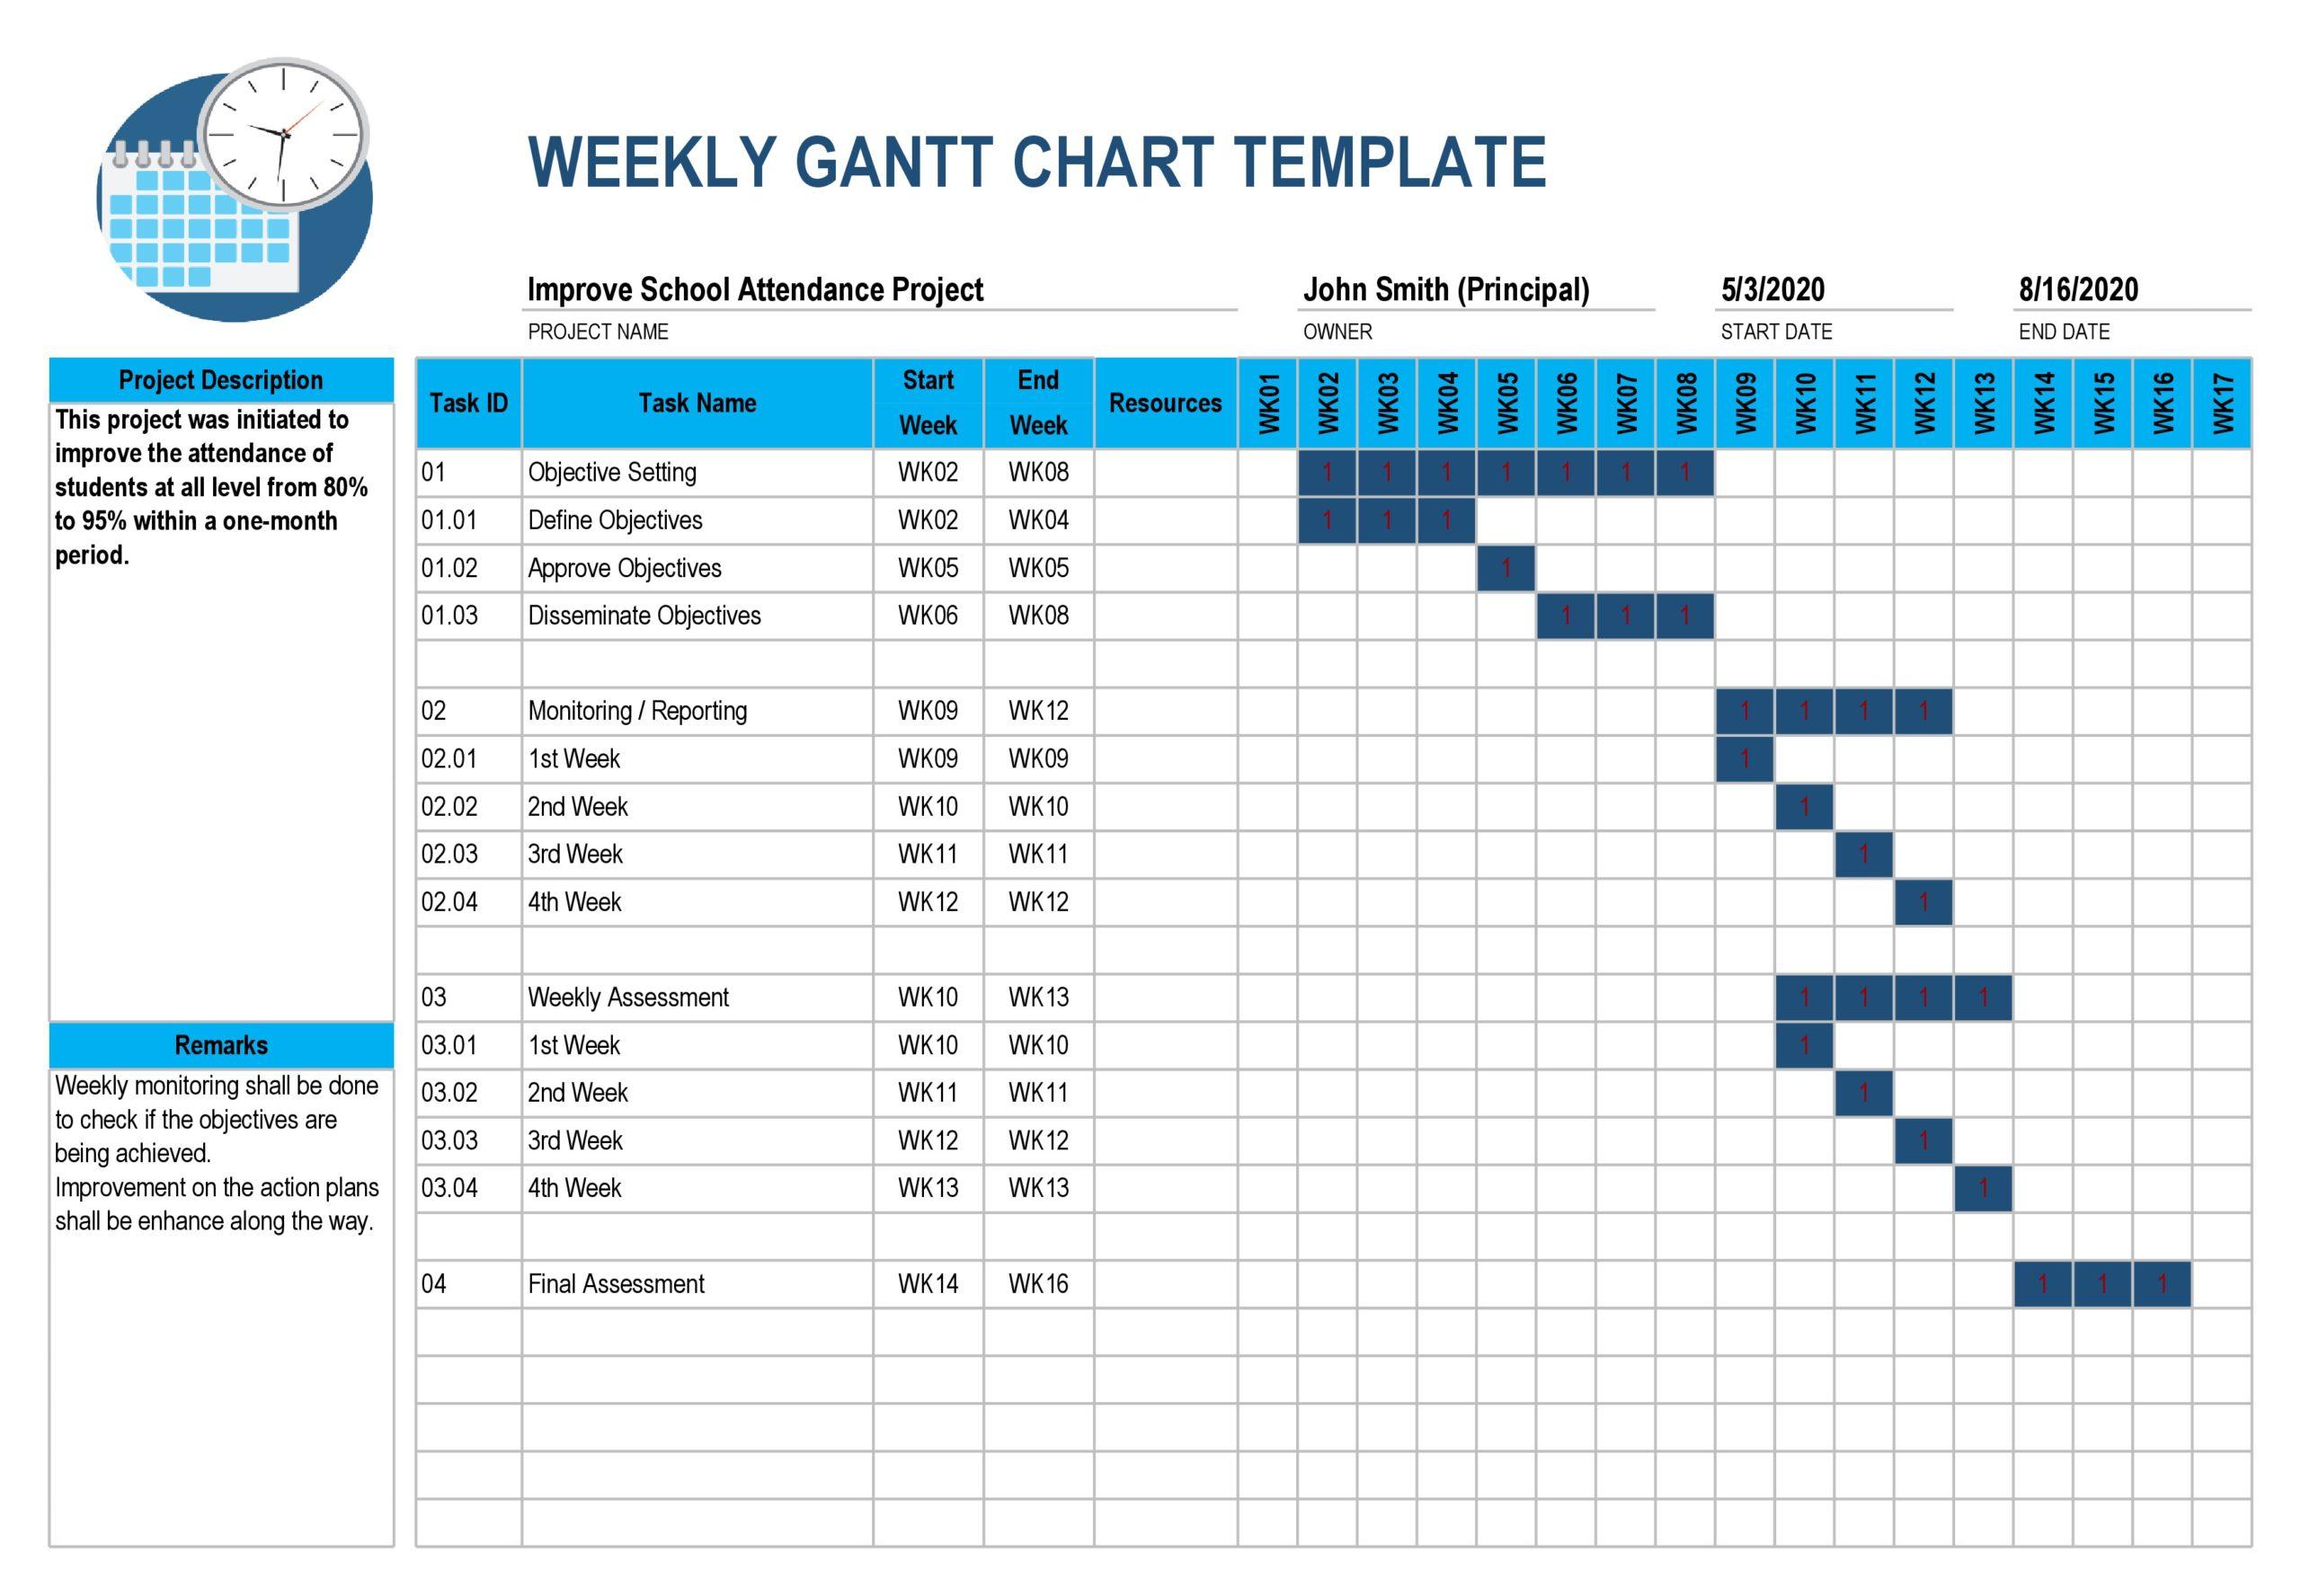 Free Weekly Gantt Chart Template - TemplateLab